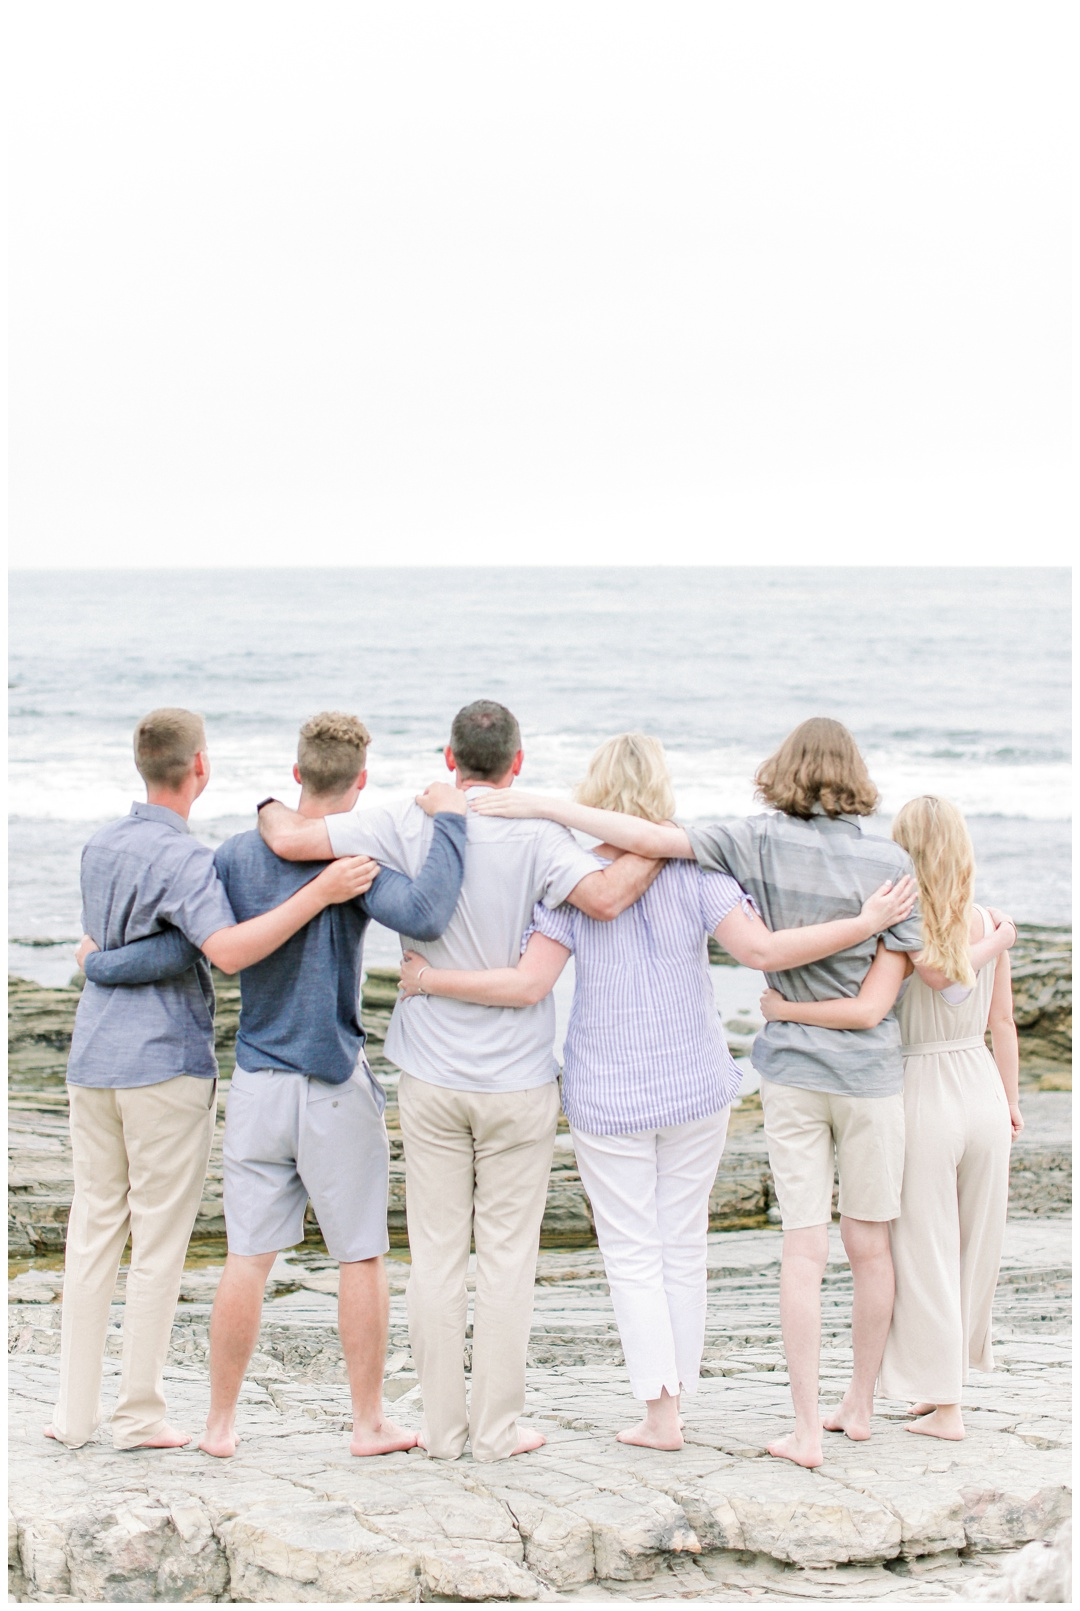 Newport_Beach_Family_Photographer_Orange_County_Family_Photography_Cori_Kleckner_Photography_Orange_County_Family_Photographer_Beach_Family_Session__1222.jpg